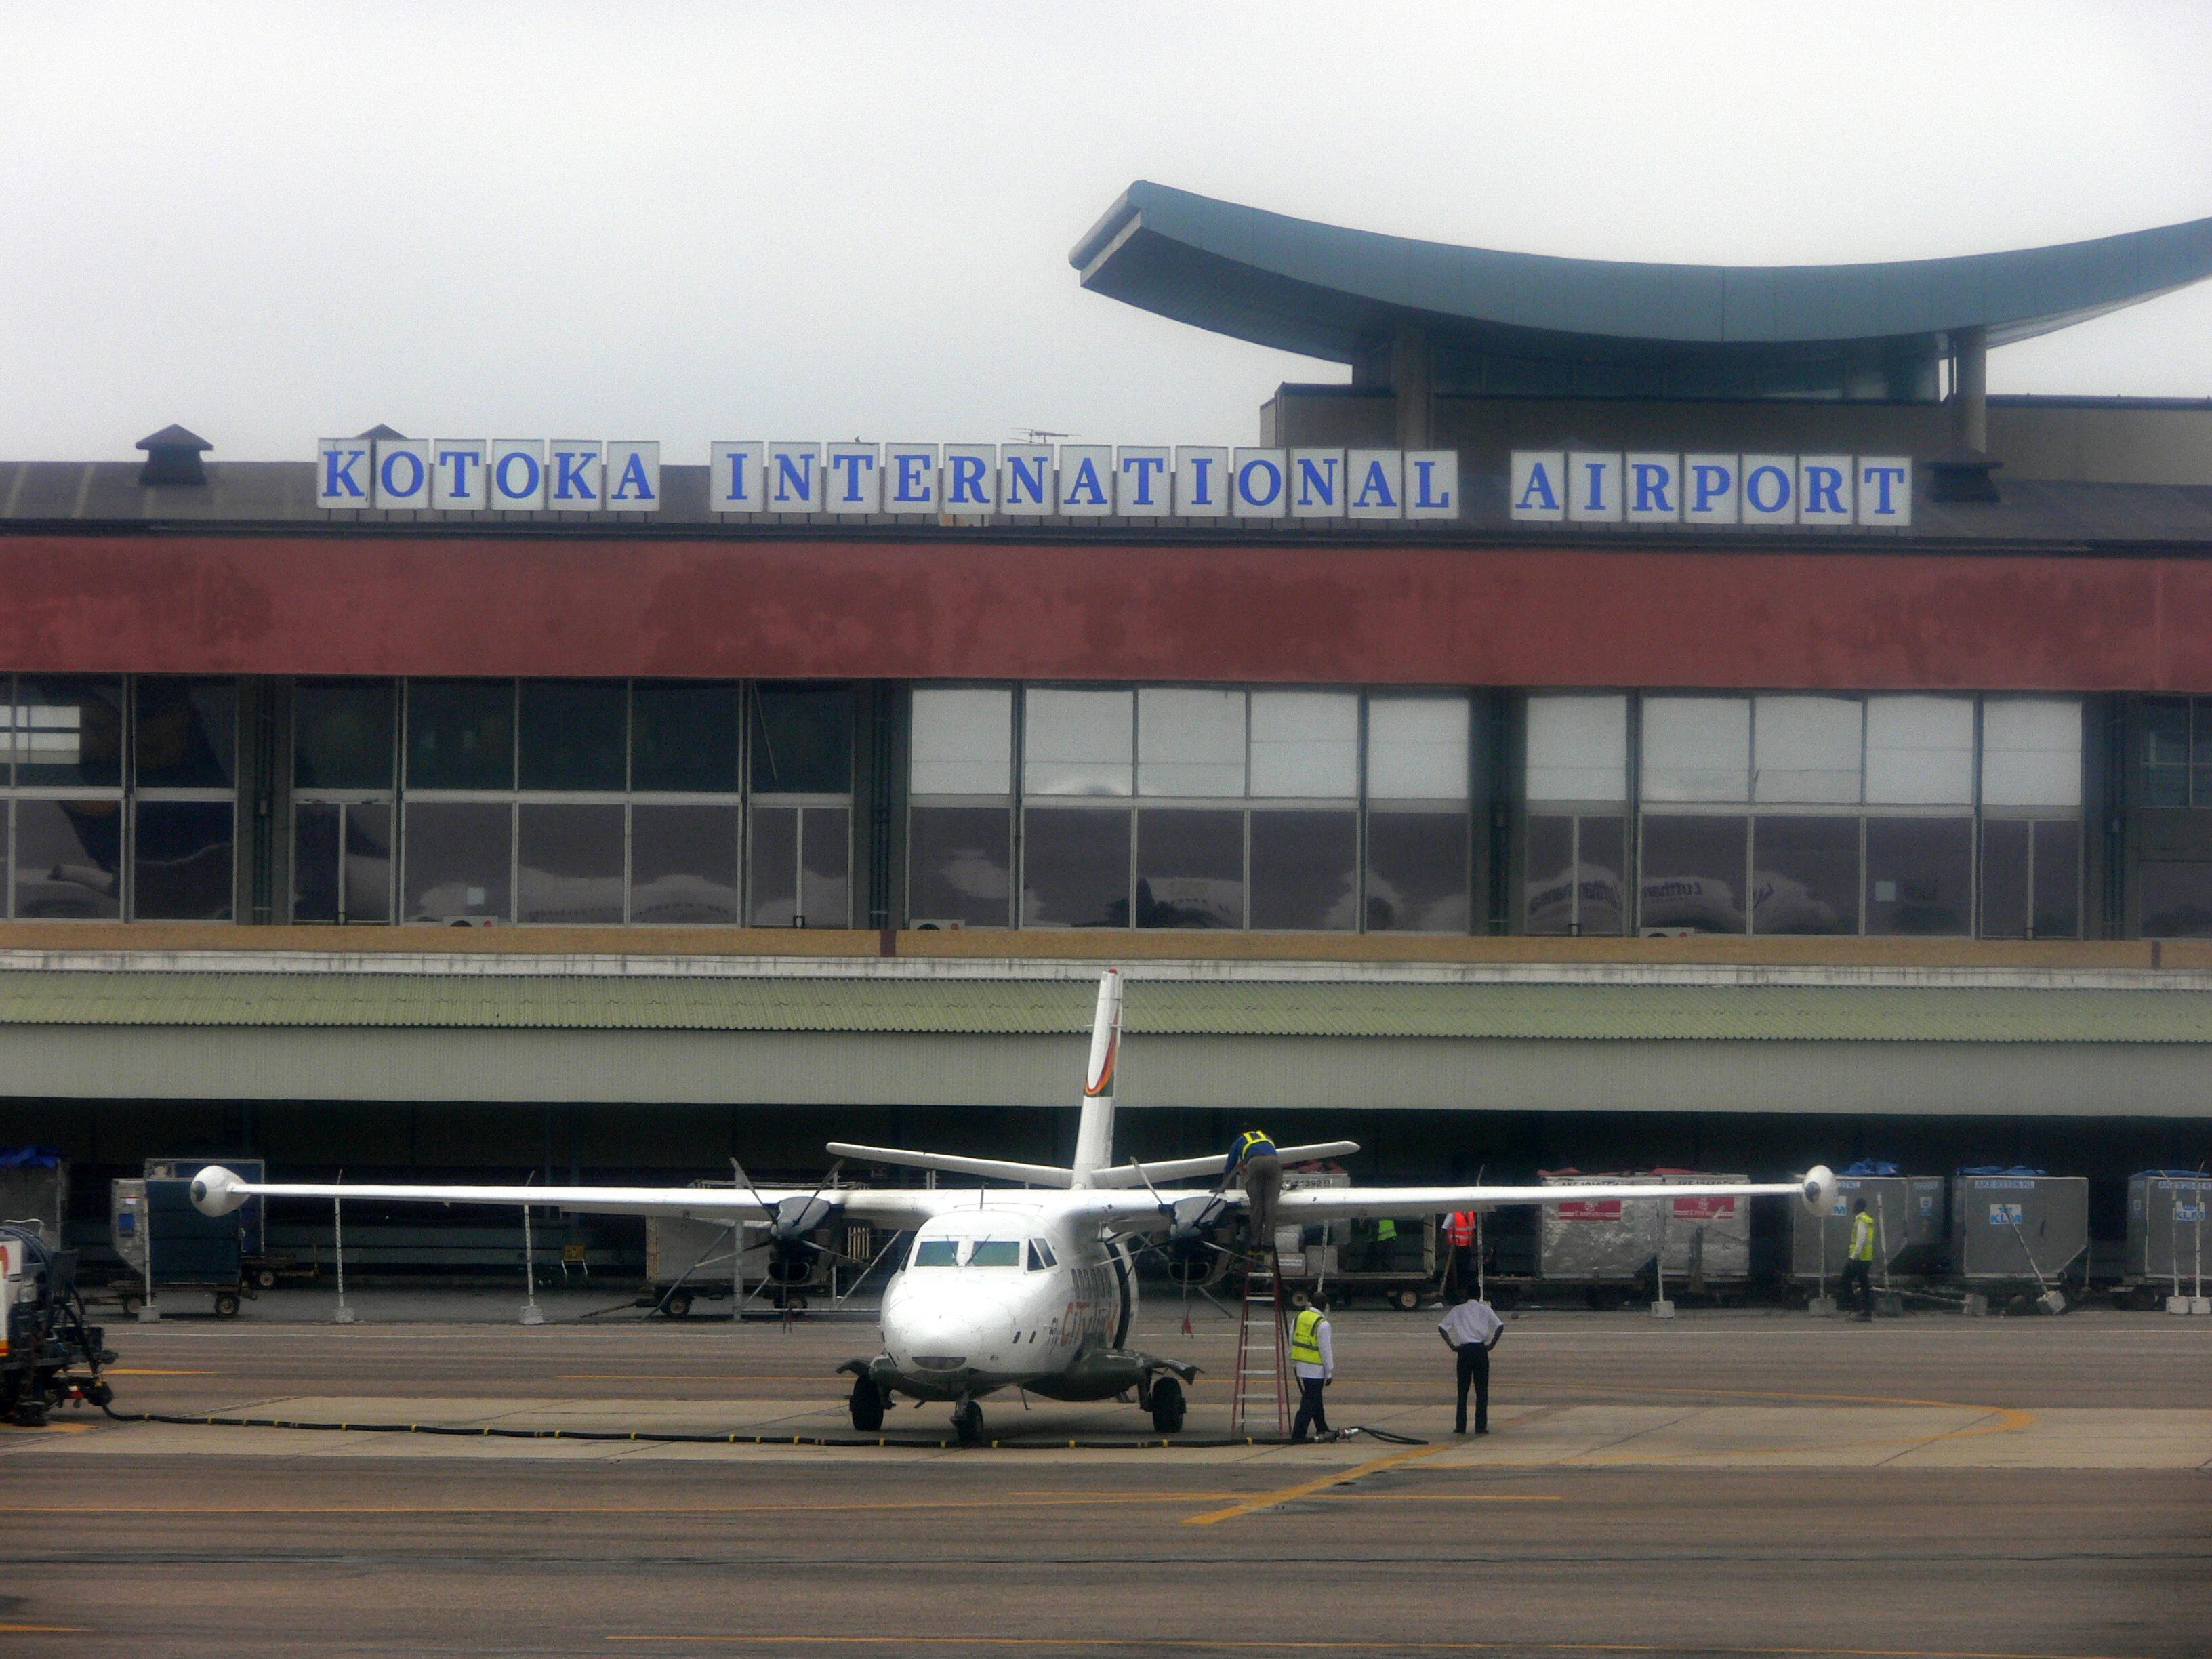 Аэропорт Аккра Котока (Accra Kotoka International Airport).